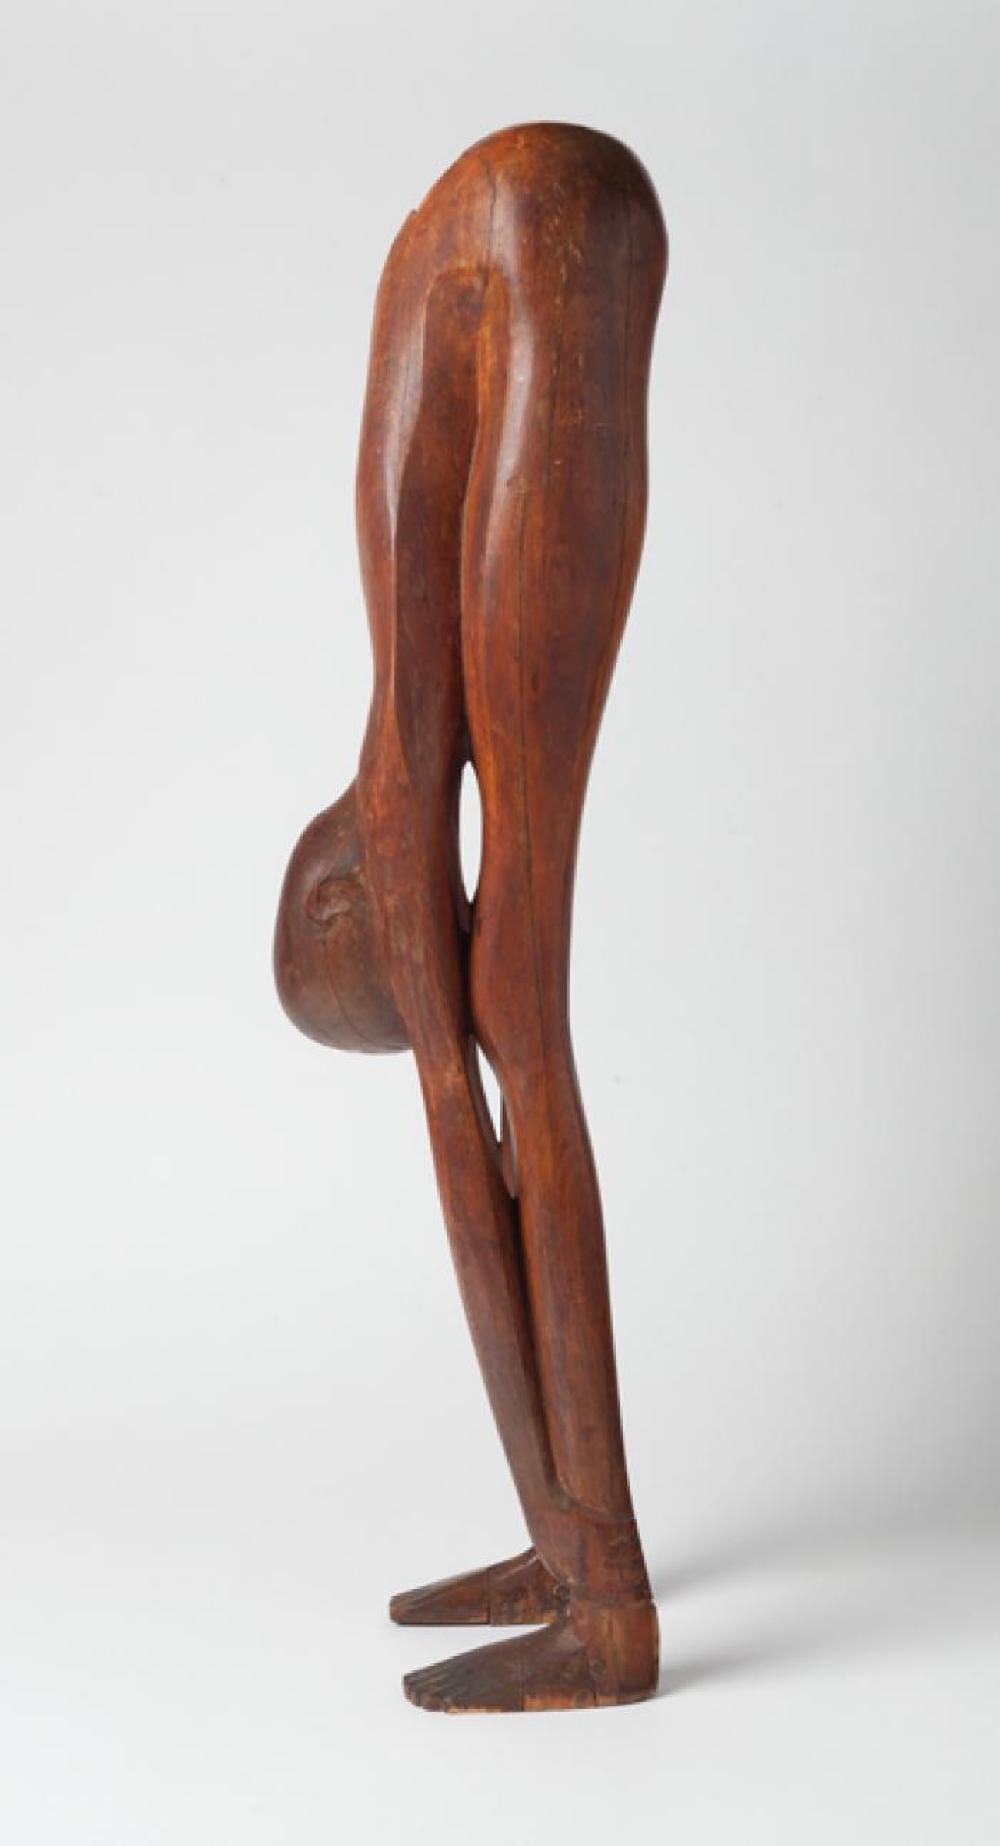 Boy Looking through Legs, image 11